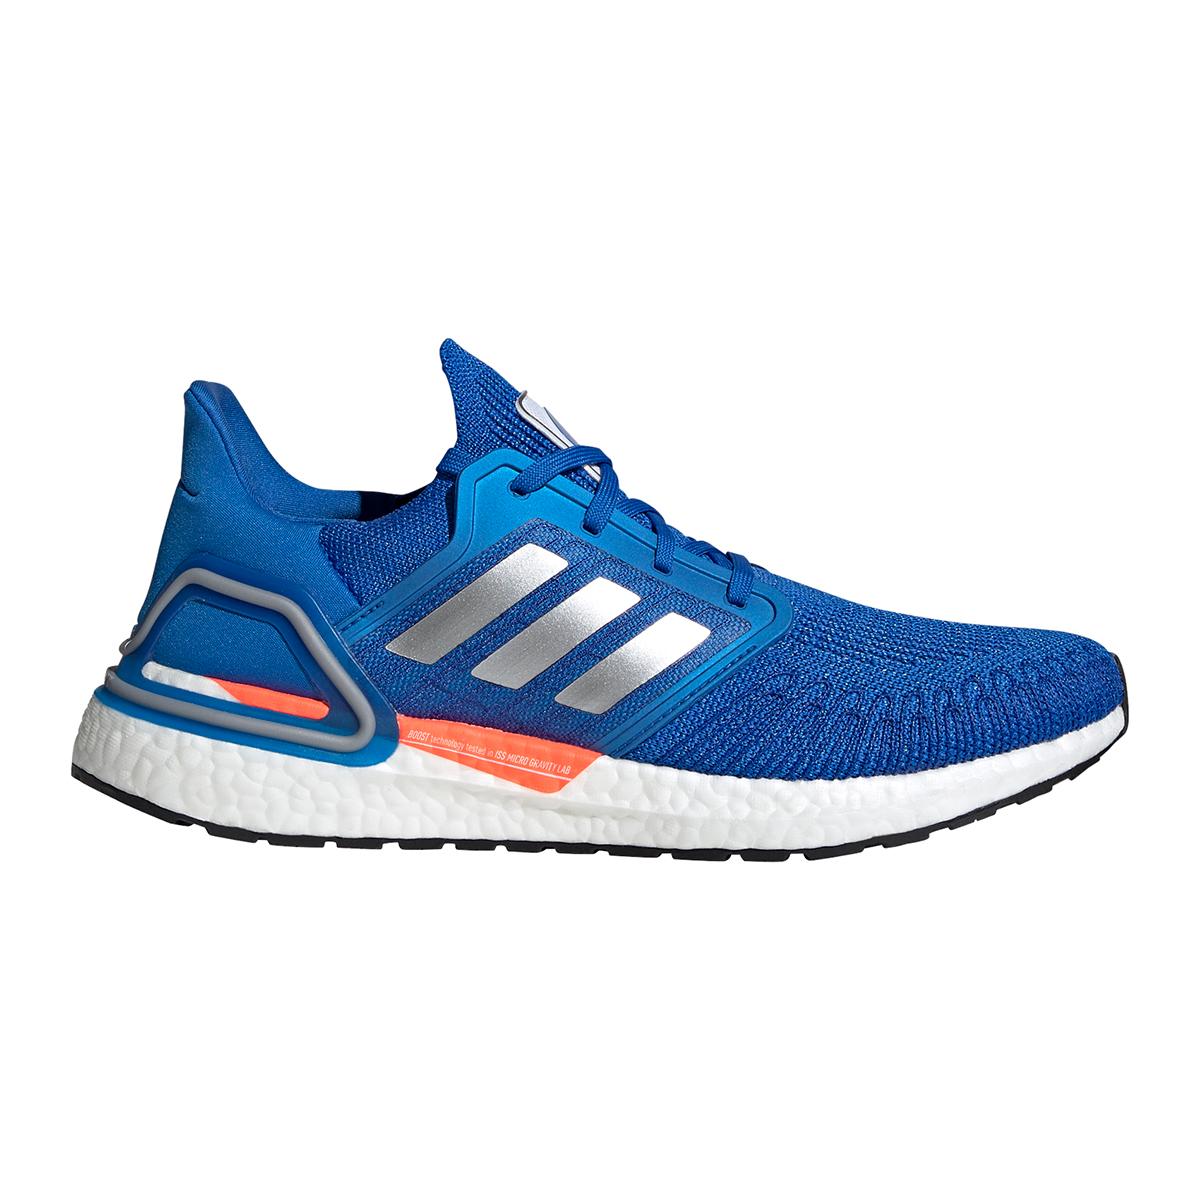 Men's Adidas Ultraboost 20 Running Shoe - Color: Football Blue - Size: 5 - Width: Regular, Football Blue, large, image 1